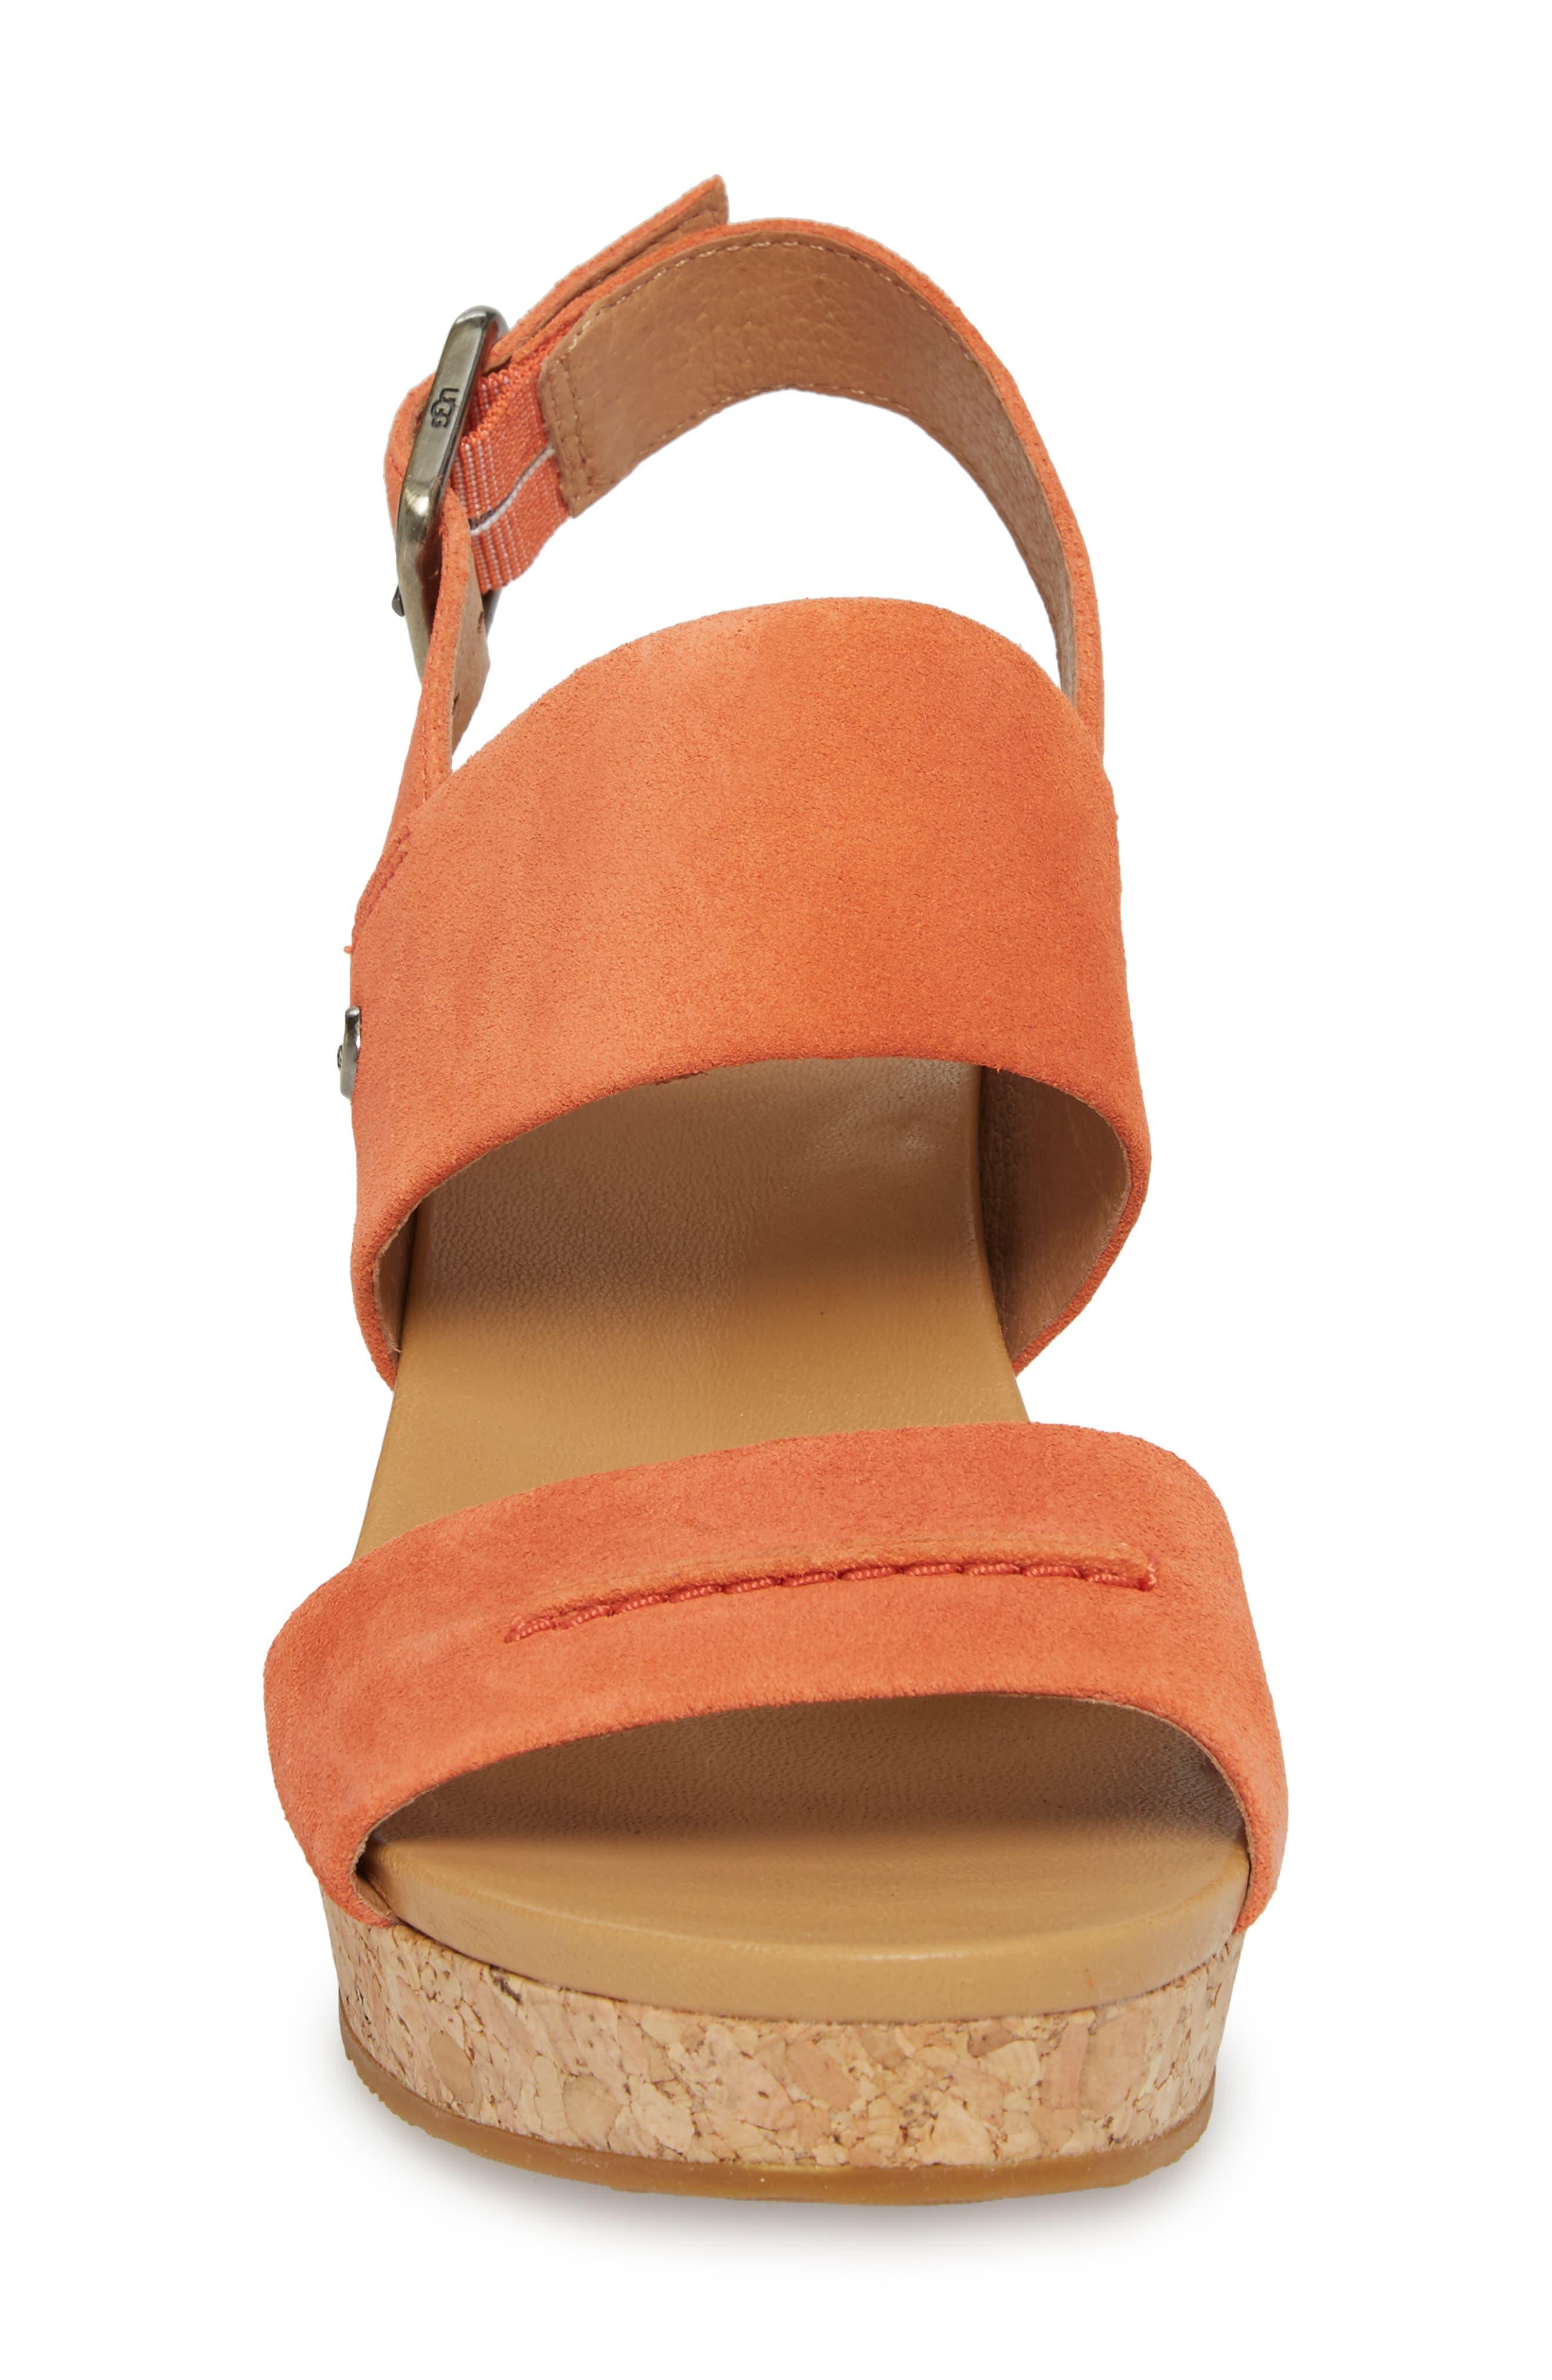 Elena II Platform Wedge Sandal,                             Alternate thumbnail 12, color,